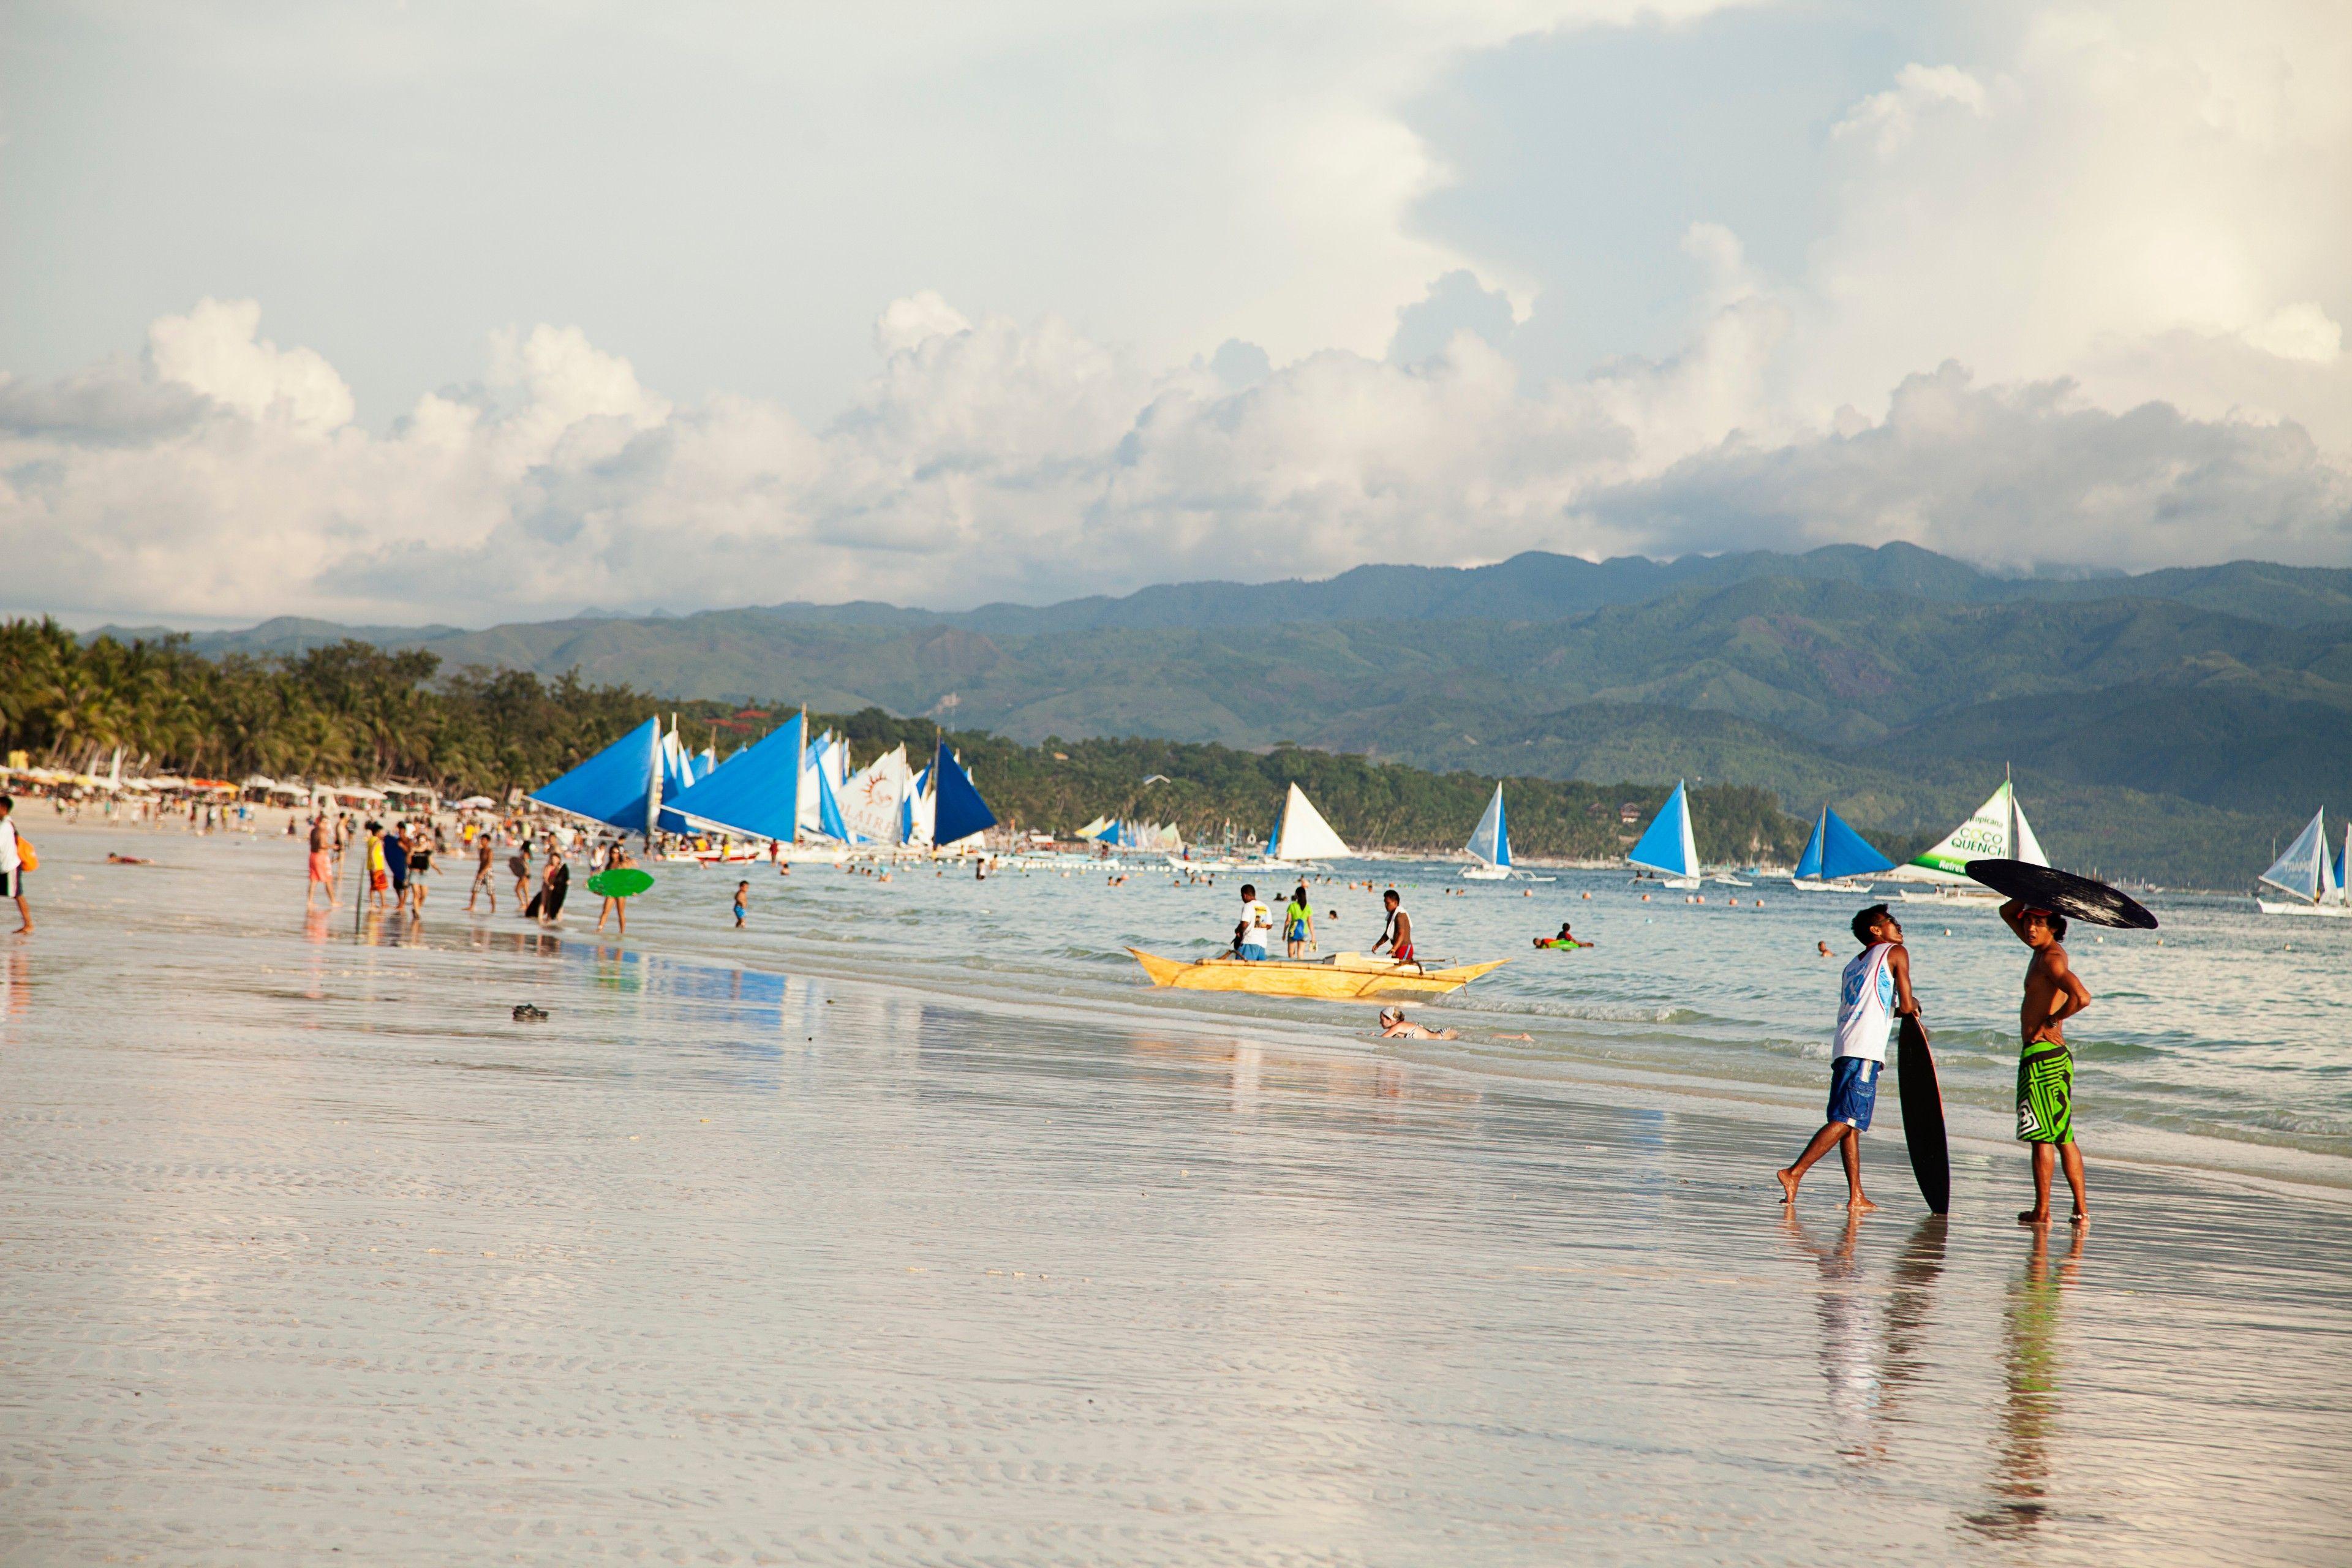 Landscape photo of the Boracay beach scene before 2020